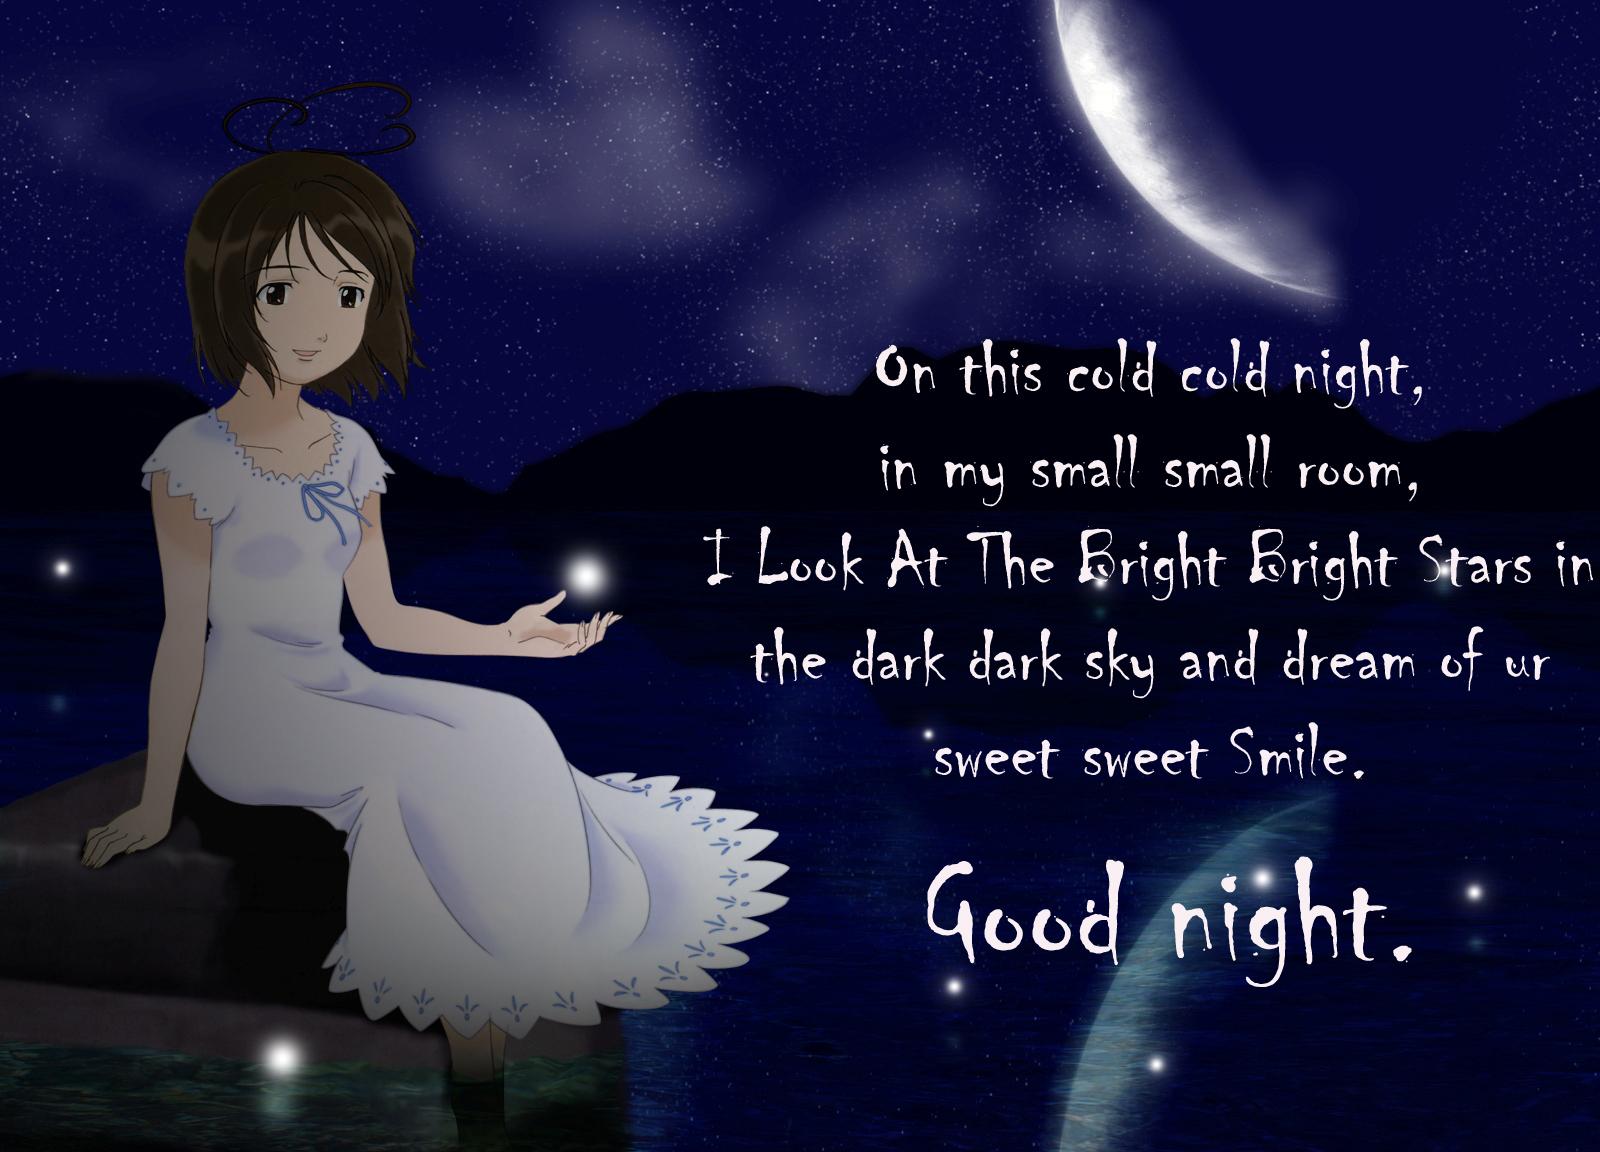 Look - Night Good sweet dreams facebook pictures video